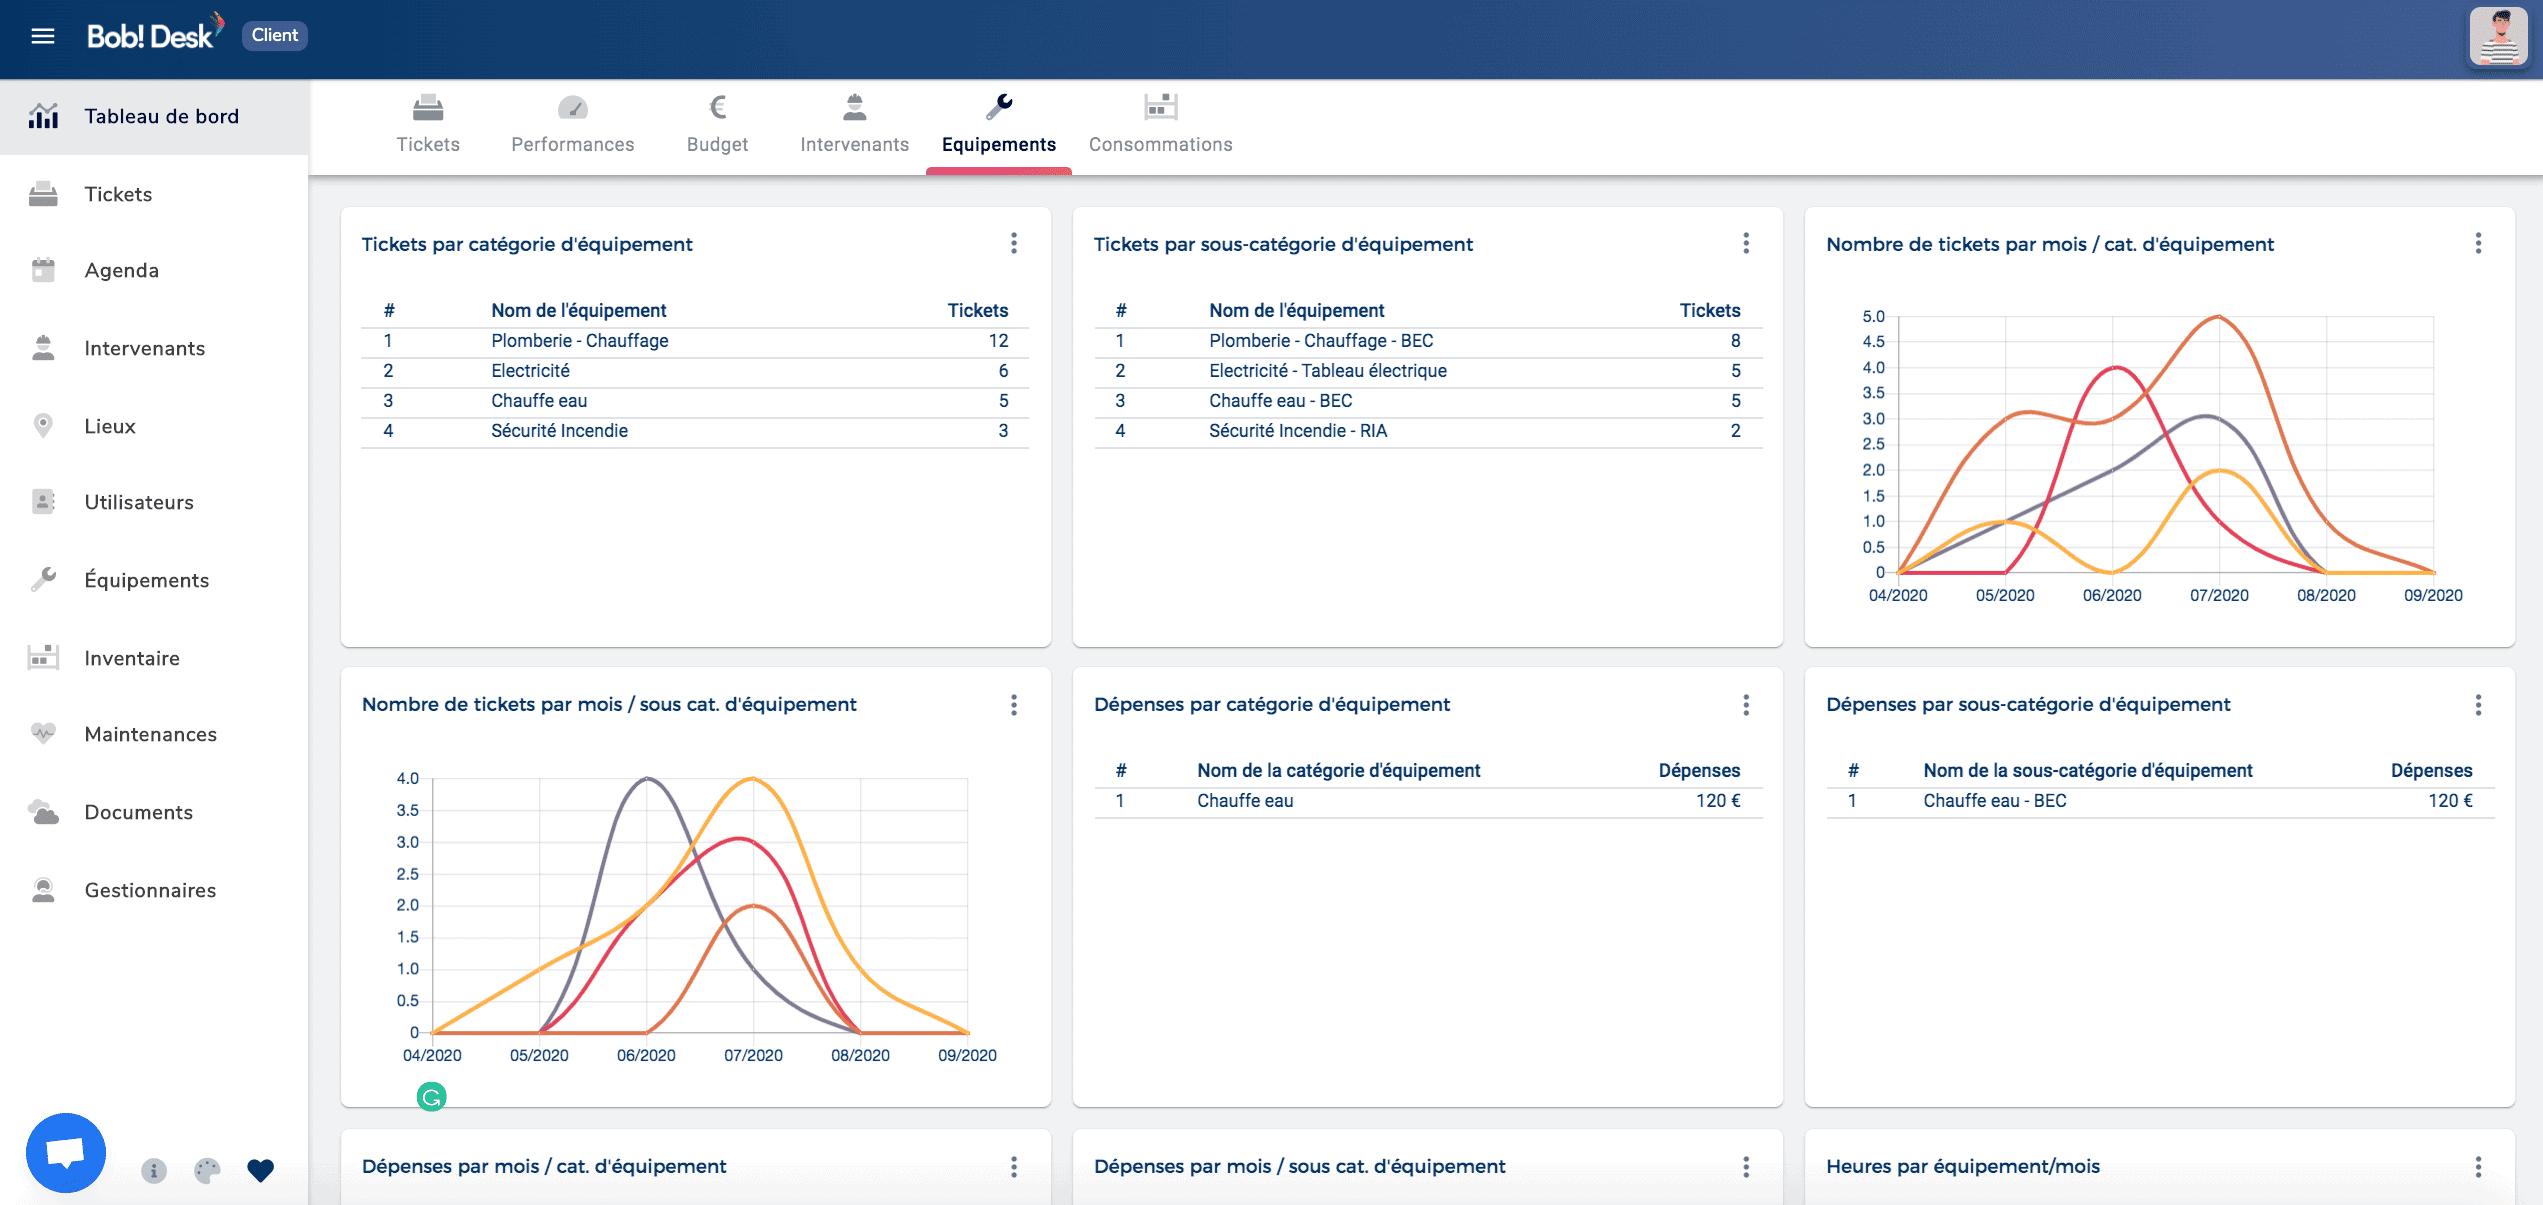 Bob Desk - GMAO - Maintenance fonctionnalites - performance